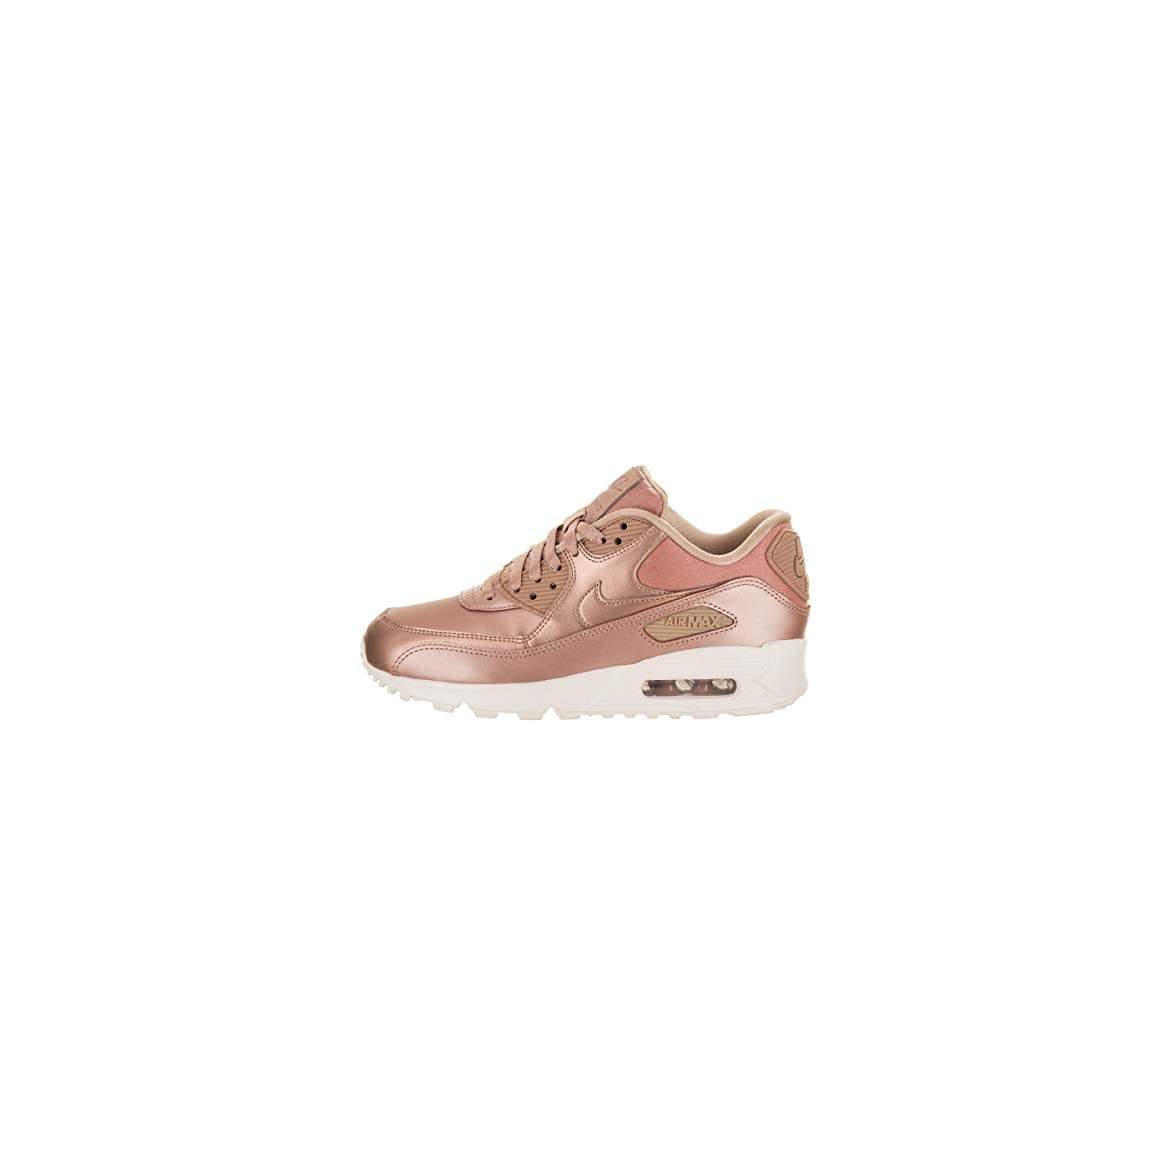 Nike Scarpe Air Max 90 nbsp;prem